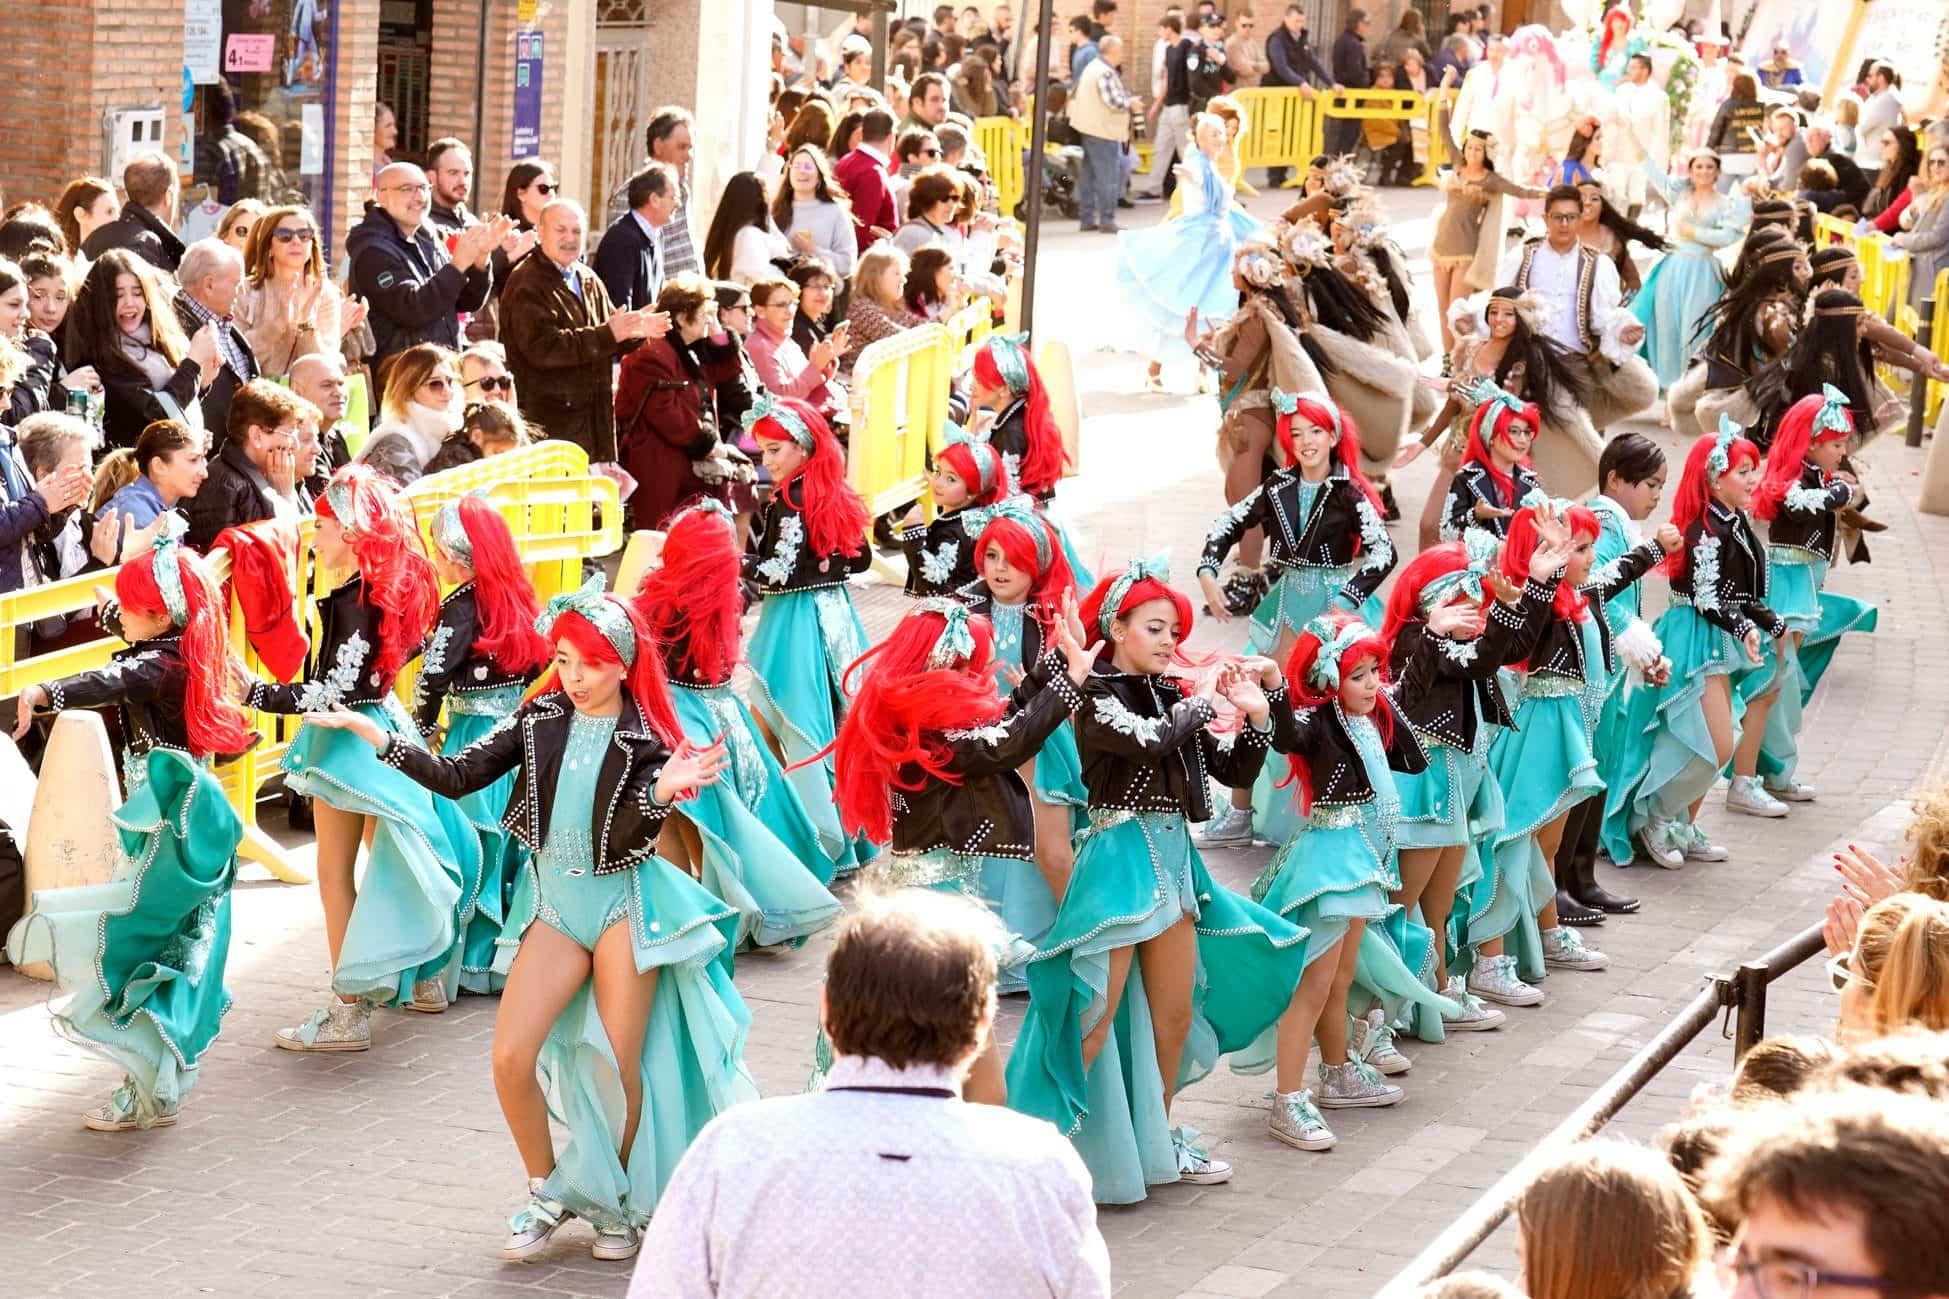 Carnaval de herencia 2020 ofertorio 21 - Selección de fotografías del Ofertorio del Carnaval de Herencia